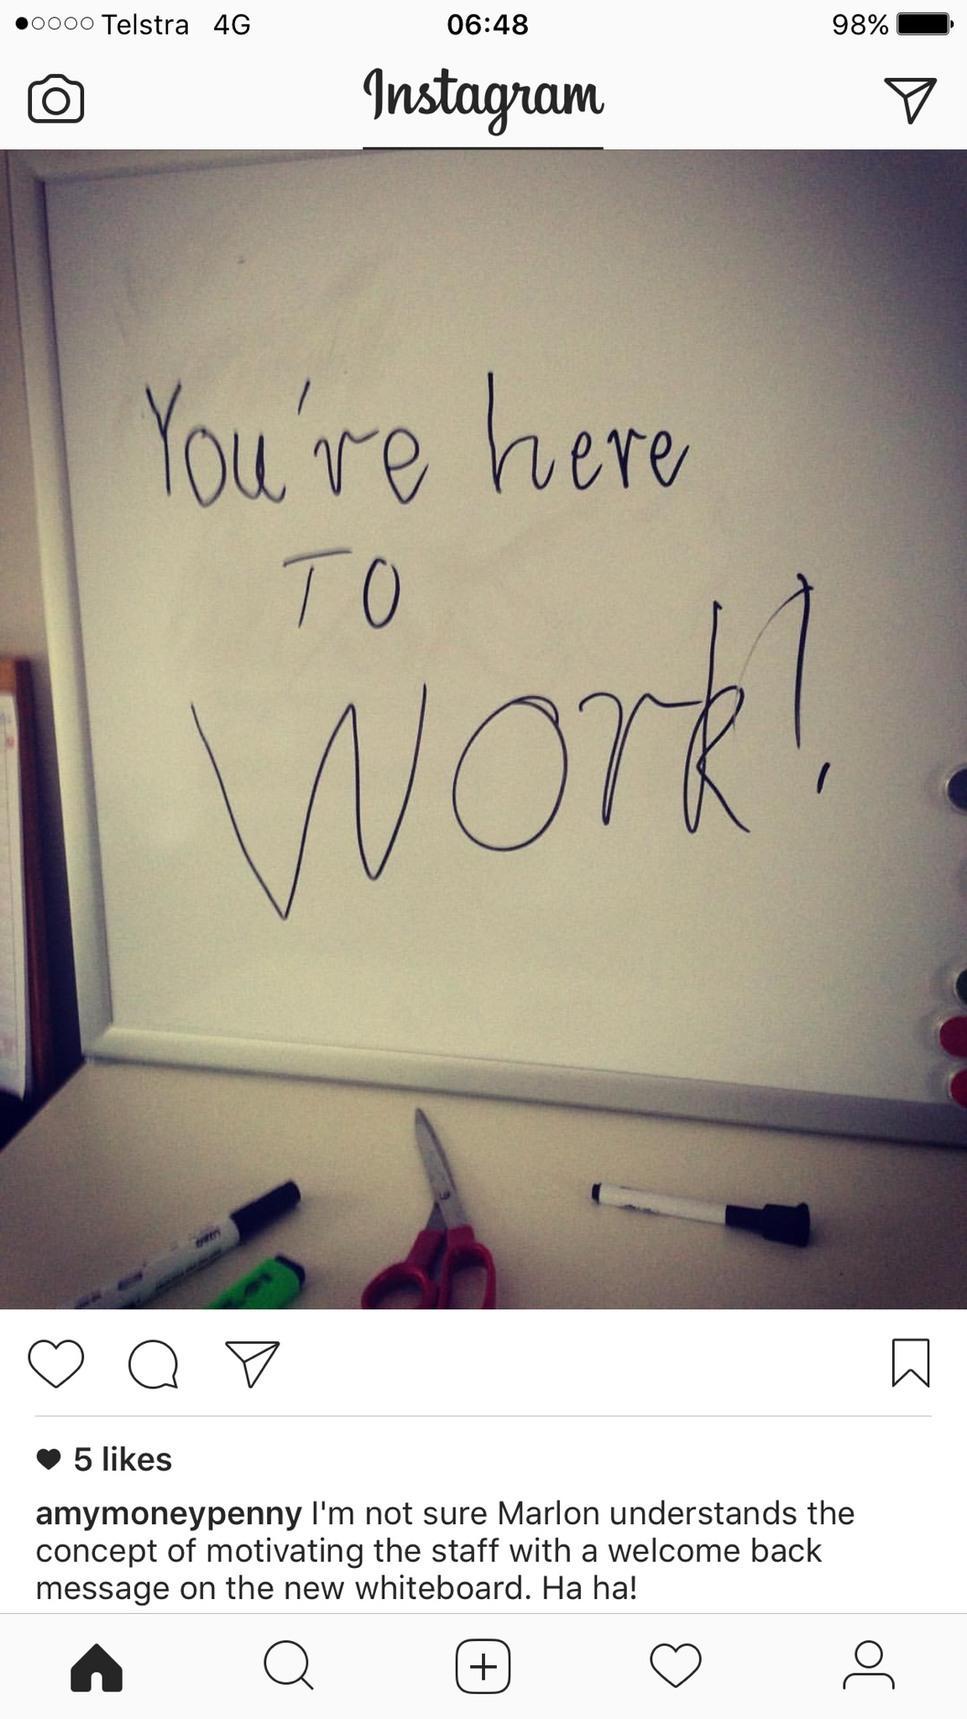 Workplace Motivation - meme